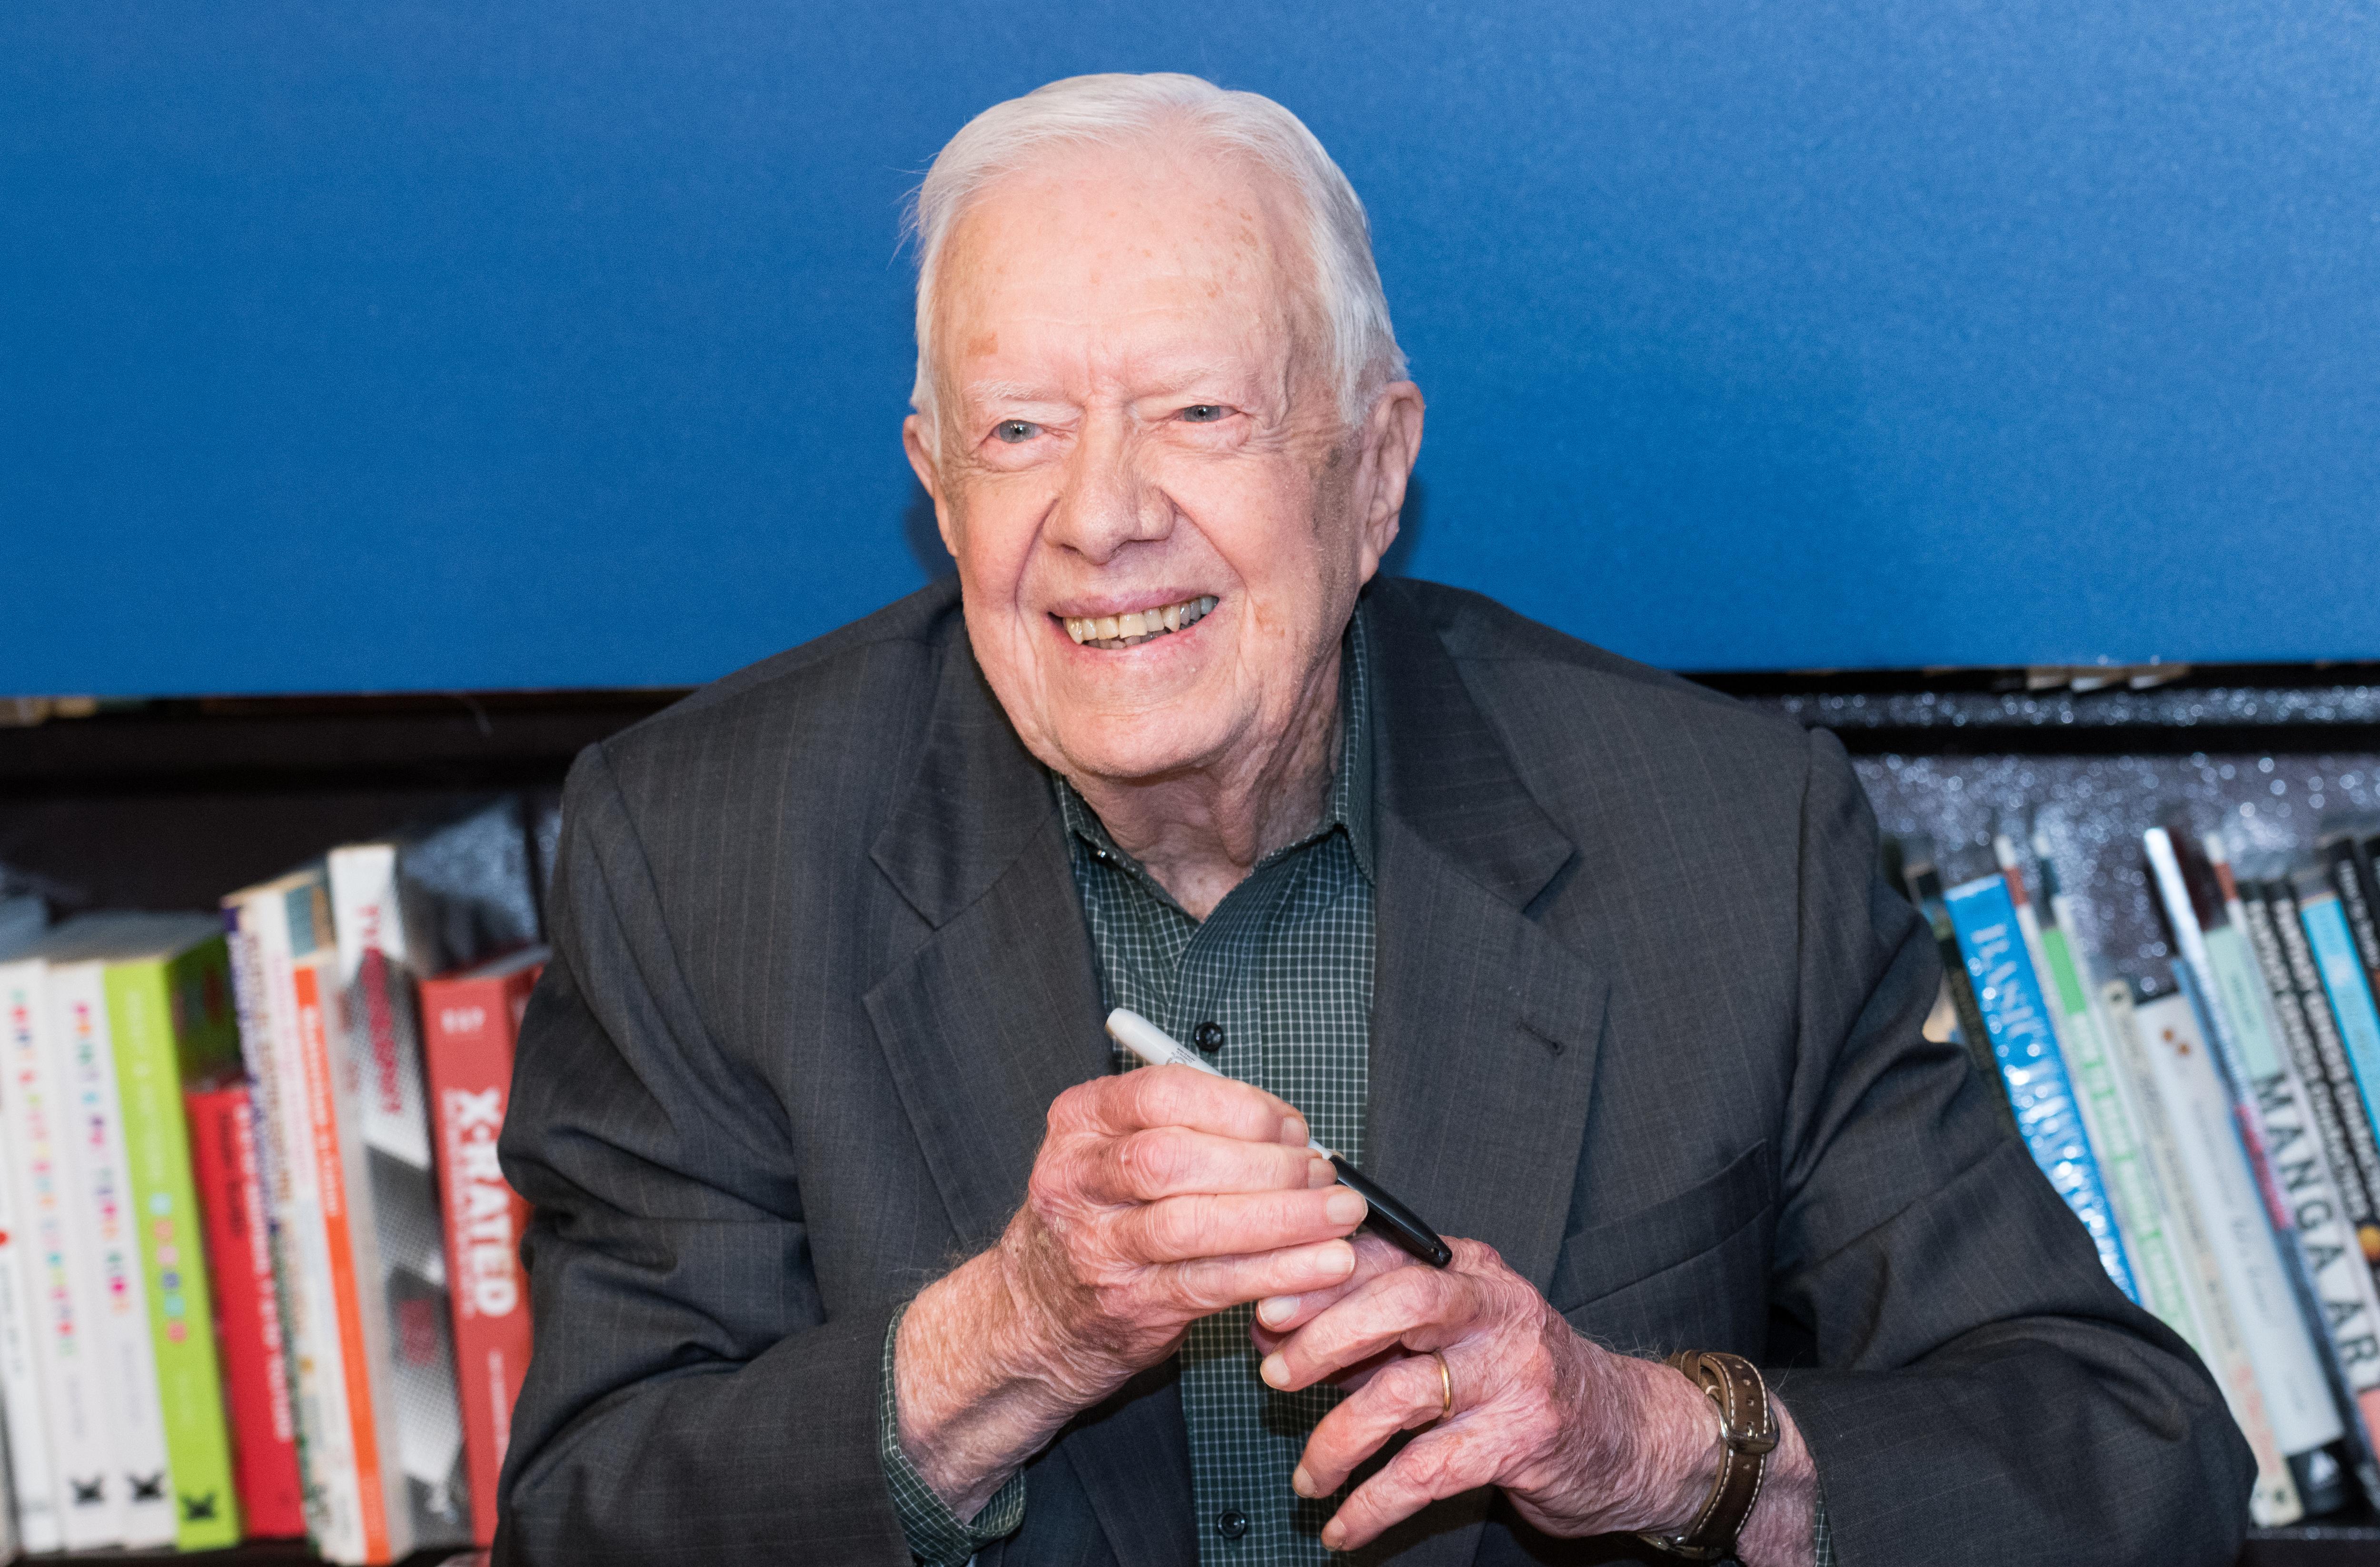 former president jimmy carter signing books